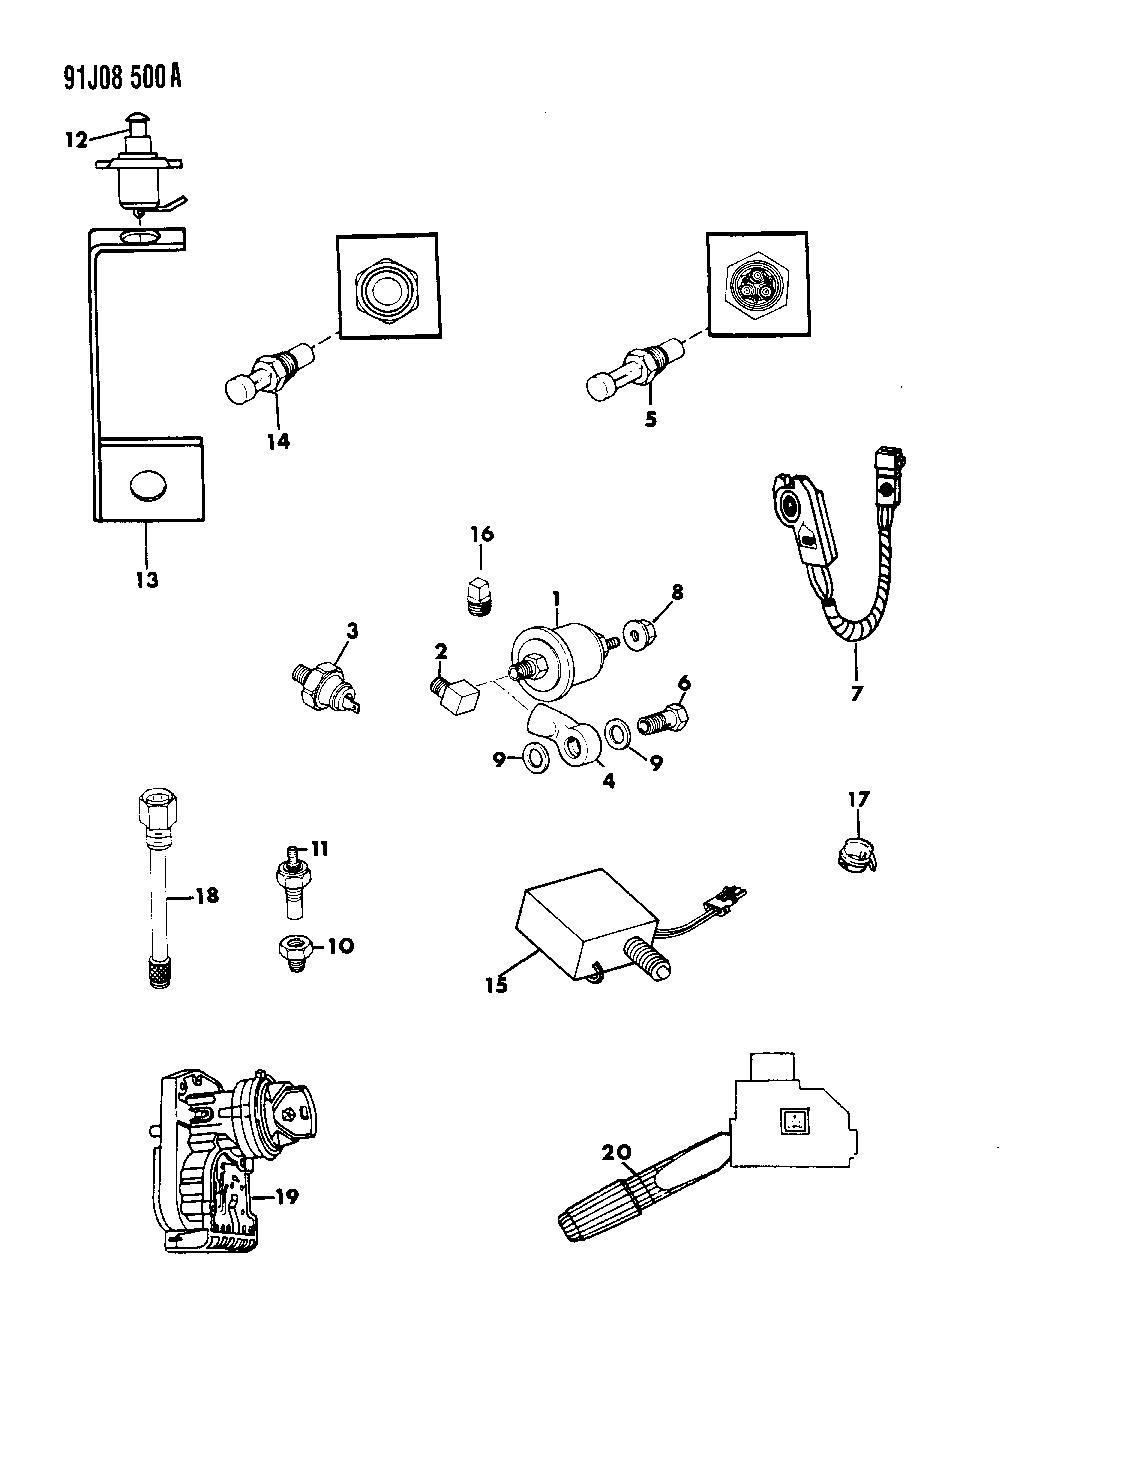 56027012 genuine mopar sensor temperature gauge jeep cherokee radio wiring diagram 1993 jeep cherokee switches & sending units